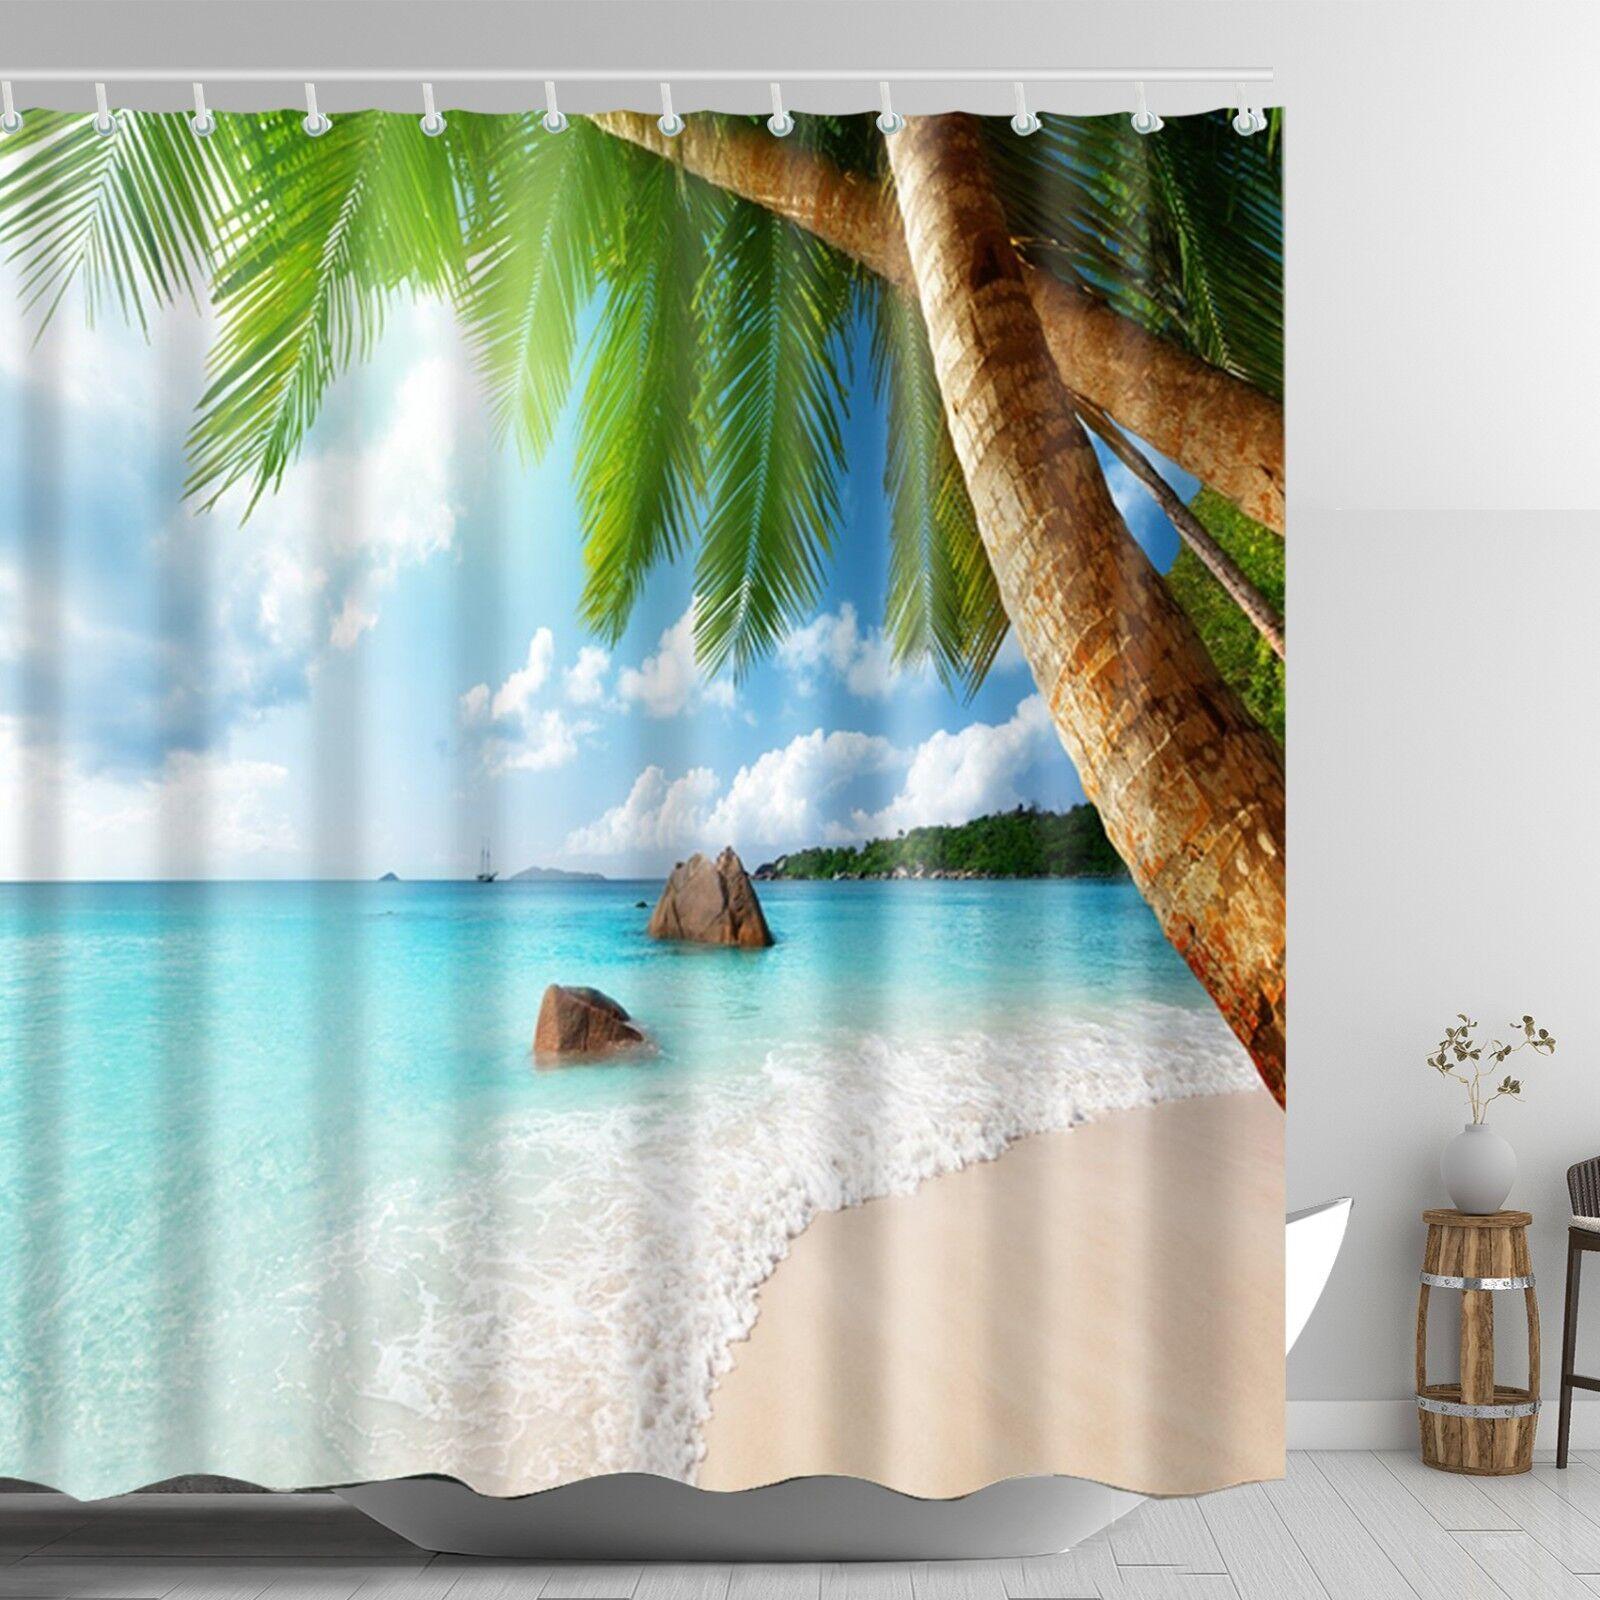 Beach Scene Shower Curtain Beach Themed Tropical Palm Bathroom 69 X 72 Inch